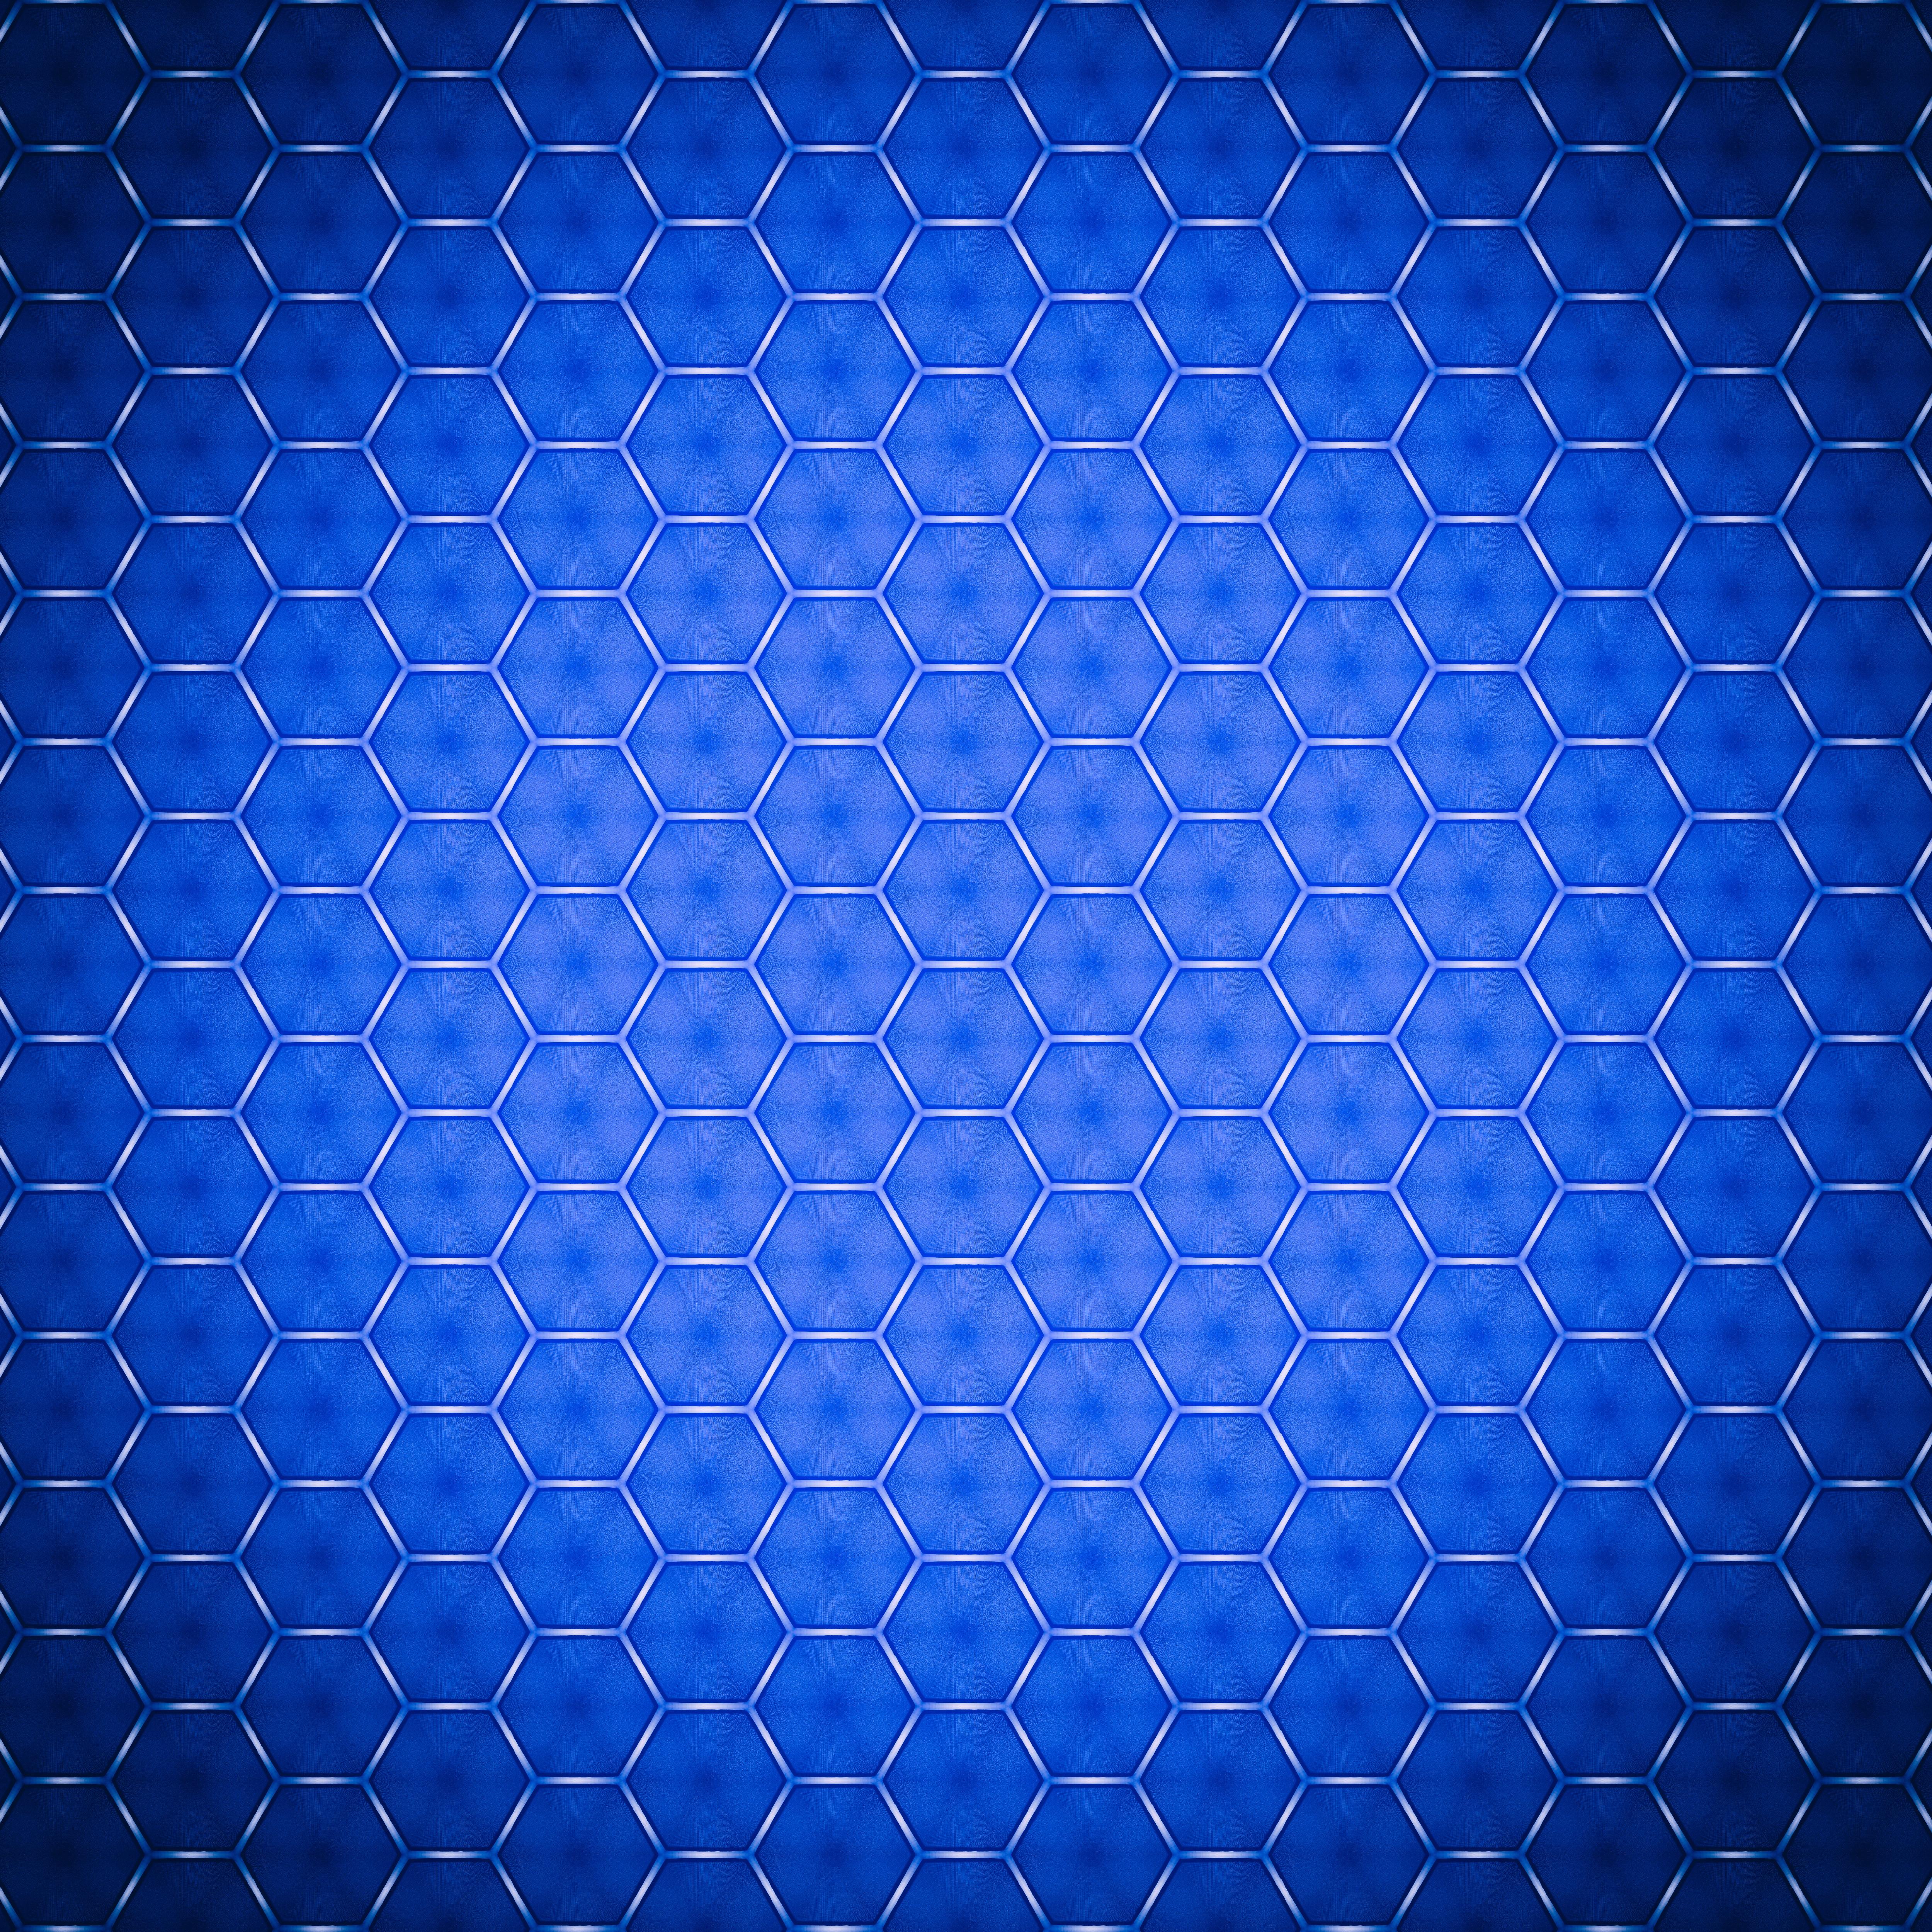 Wallpaper Texture Blue Shape 5000x5000 Wallbase